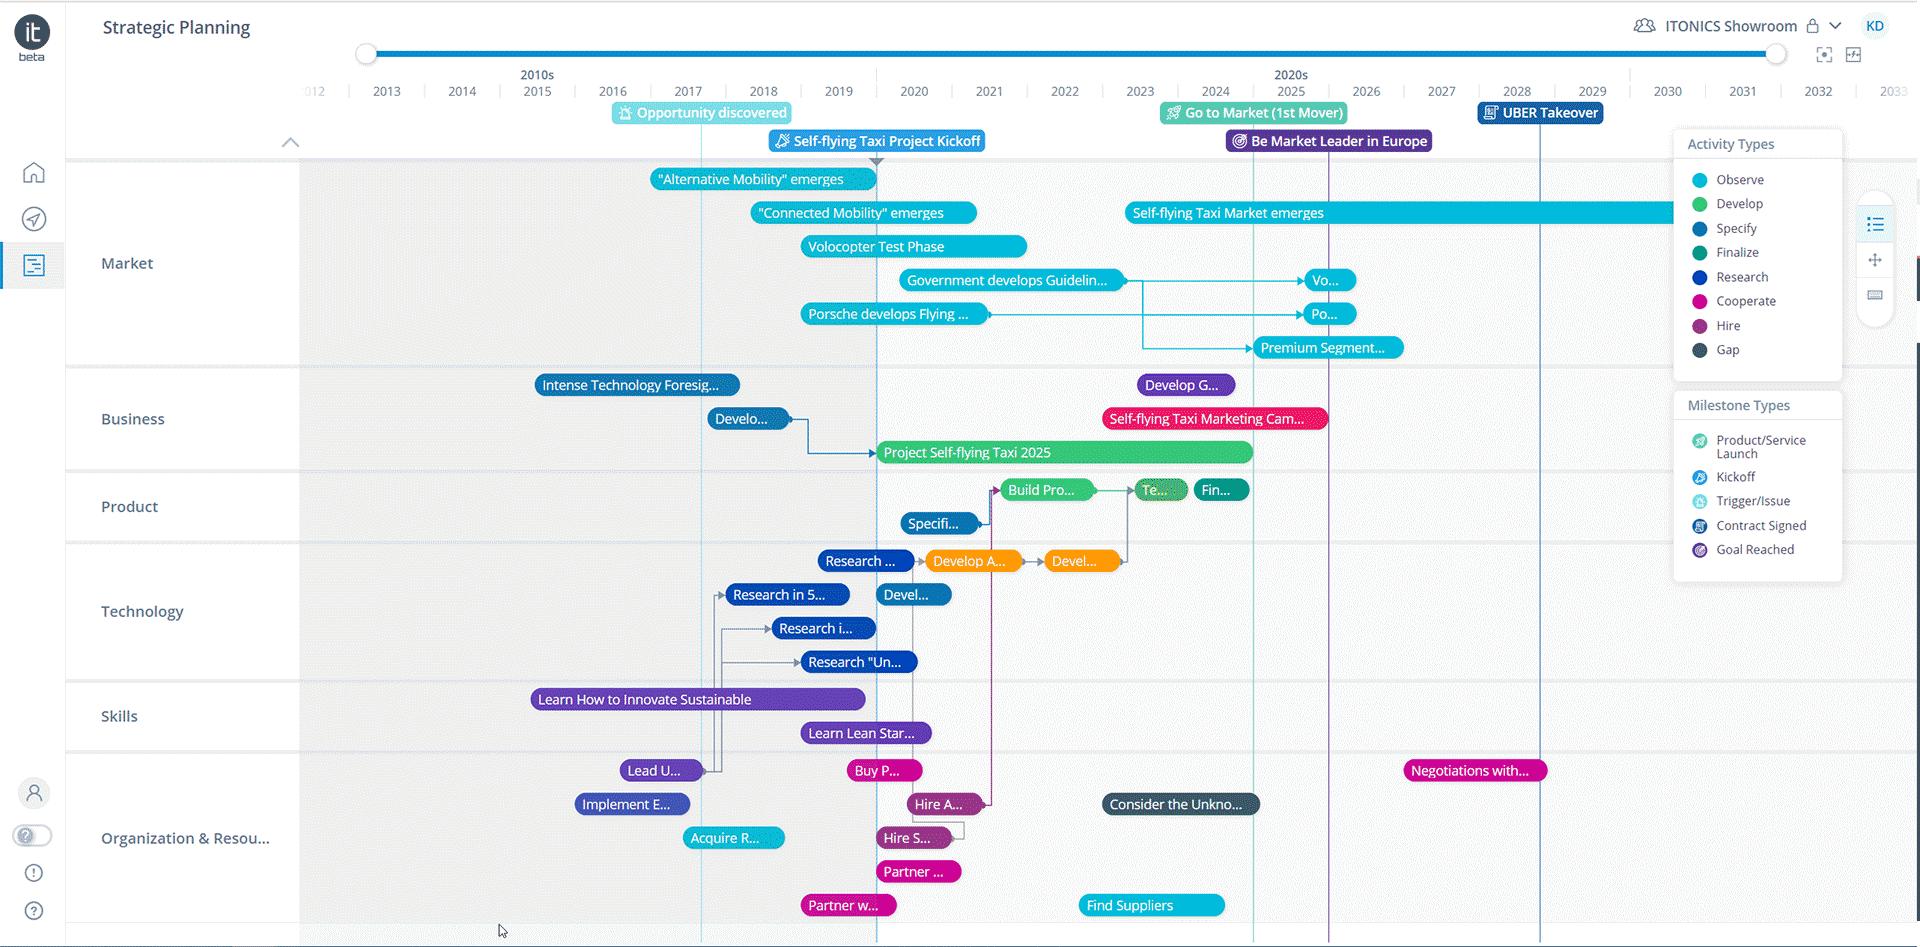 Roadmap Tool Visualization with ITONICS Roadmap